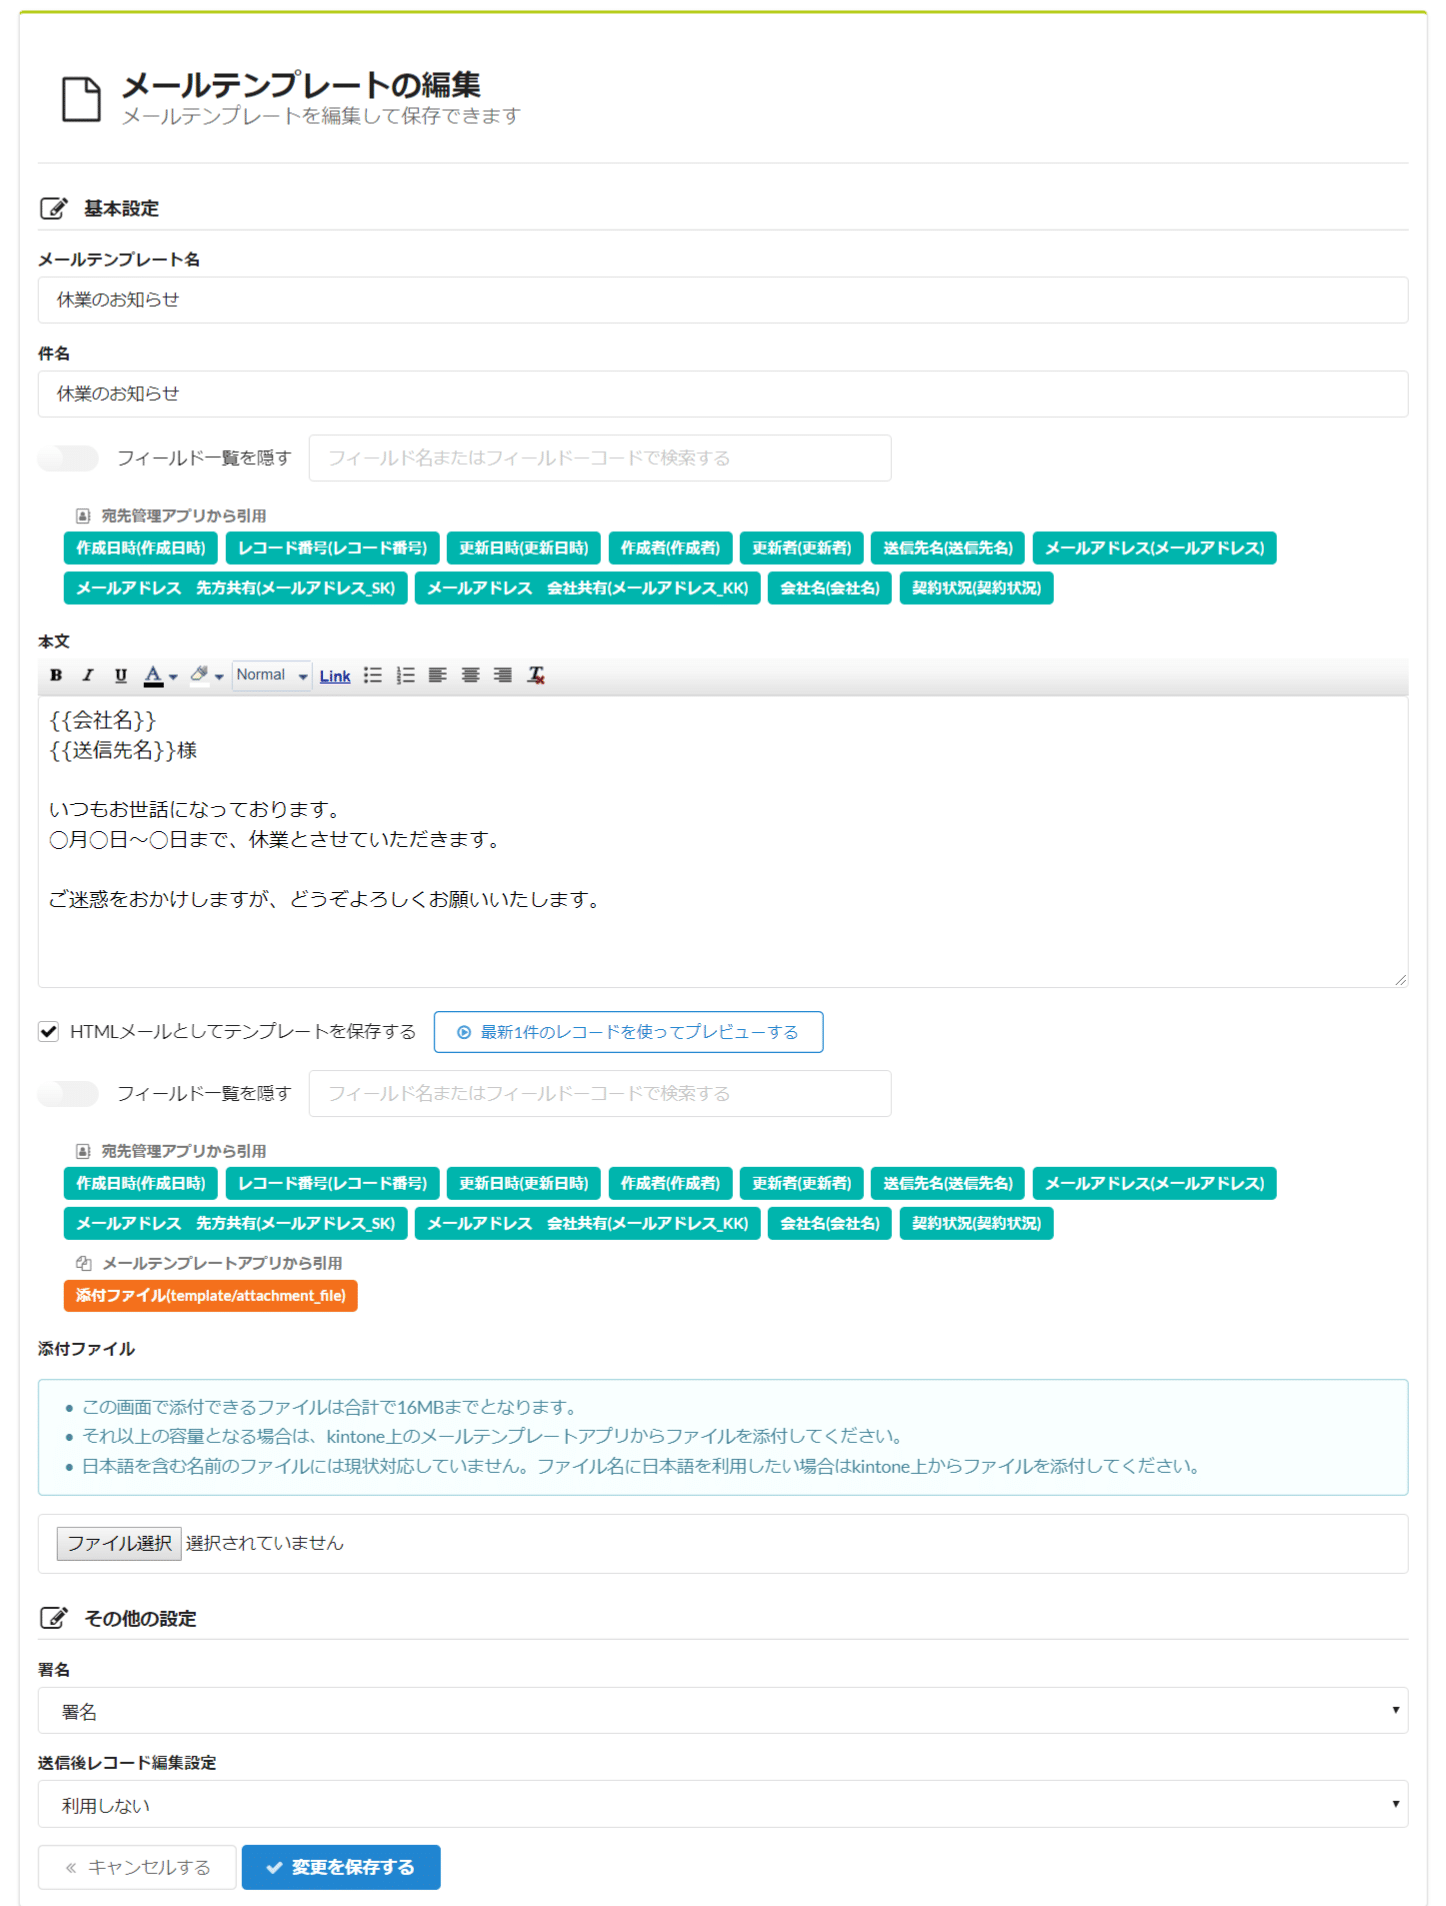 kMailerメールテンプレート設定